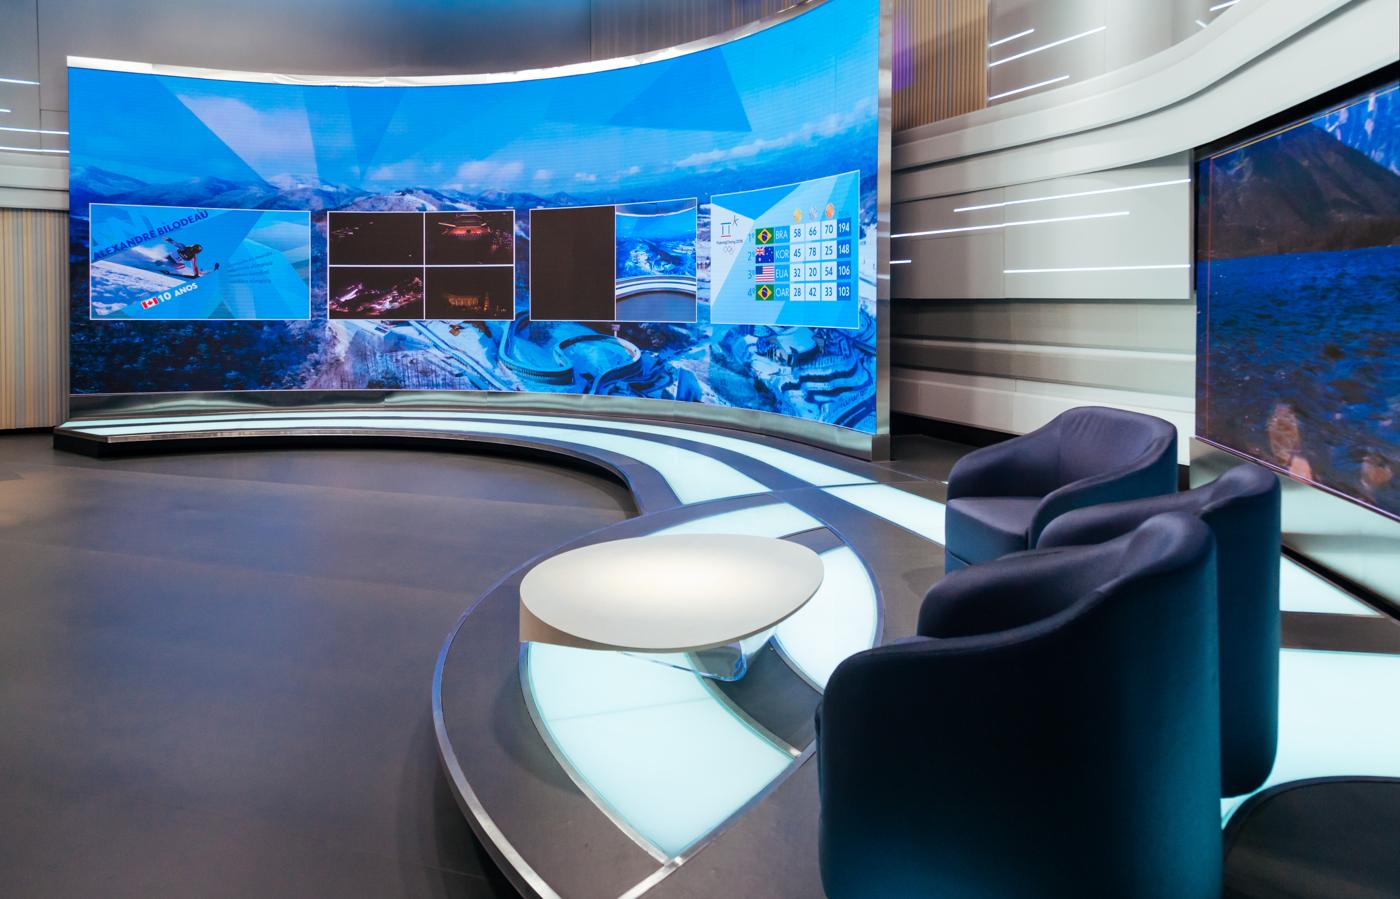 NCS_SporTV-estudio_0003